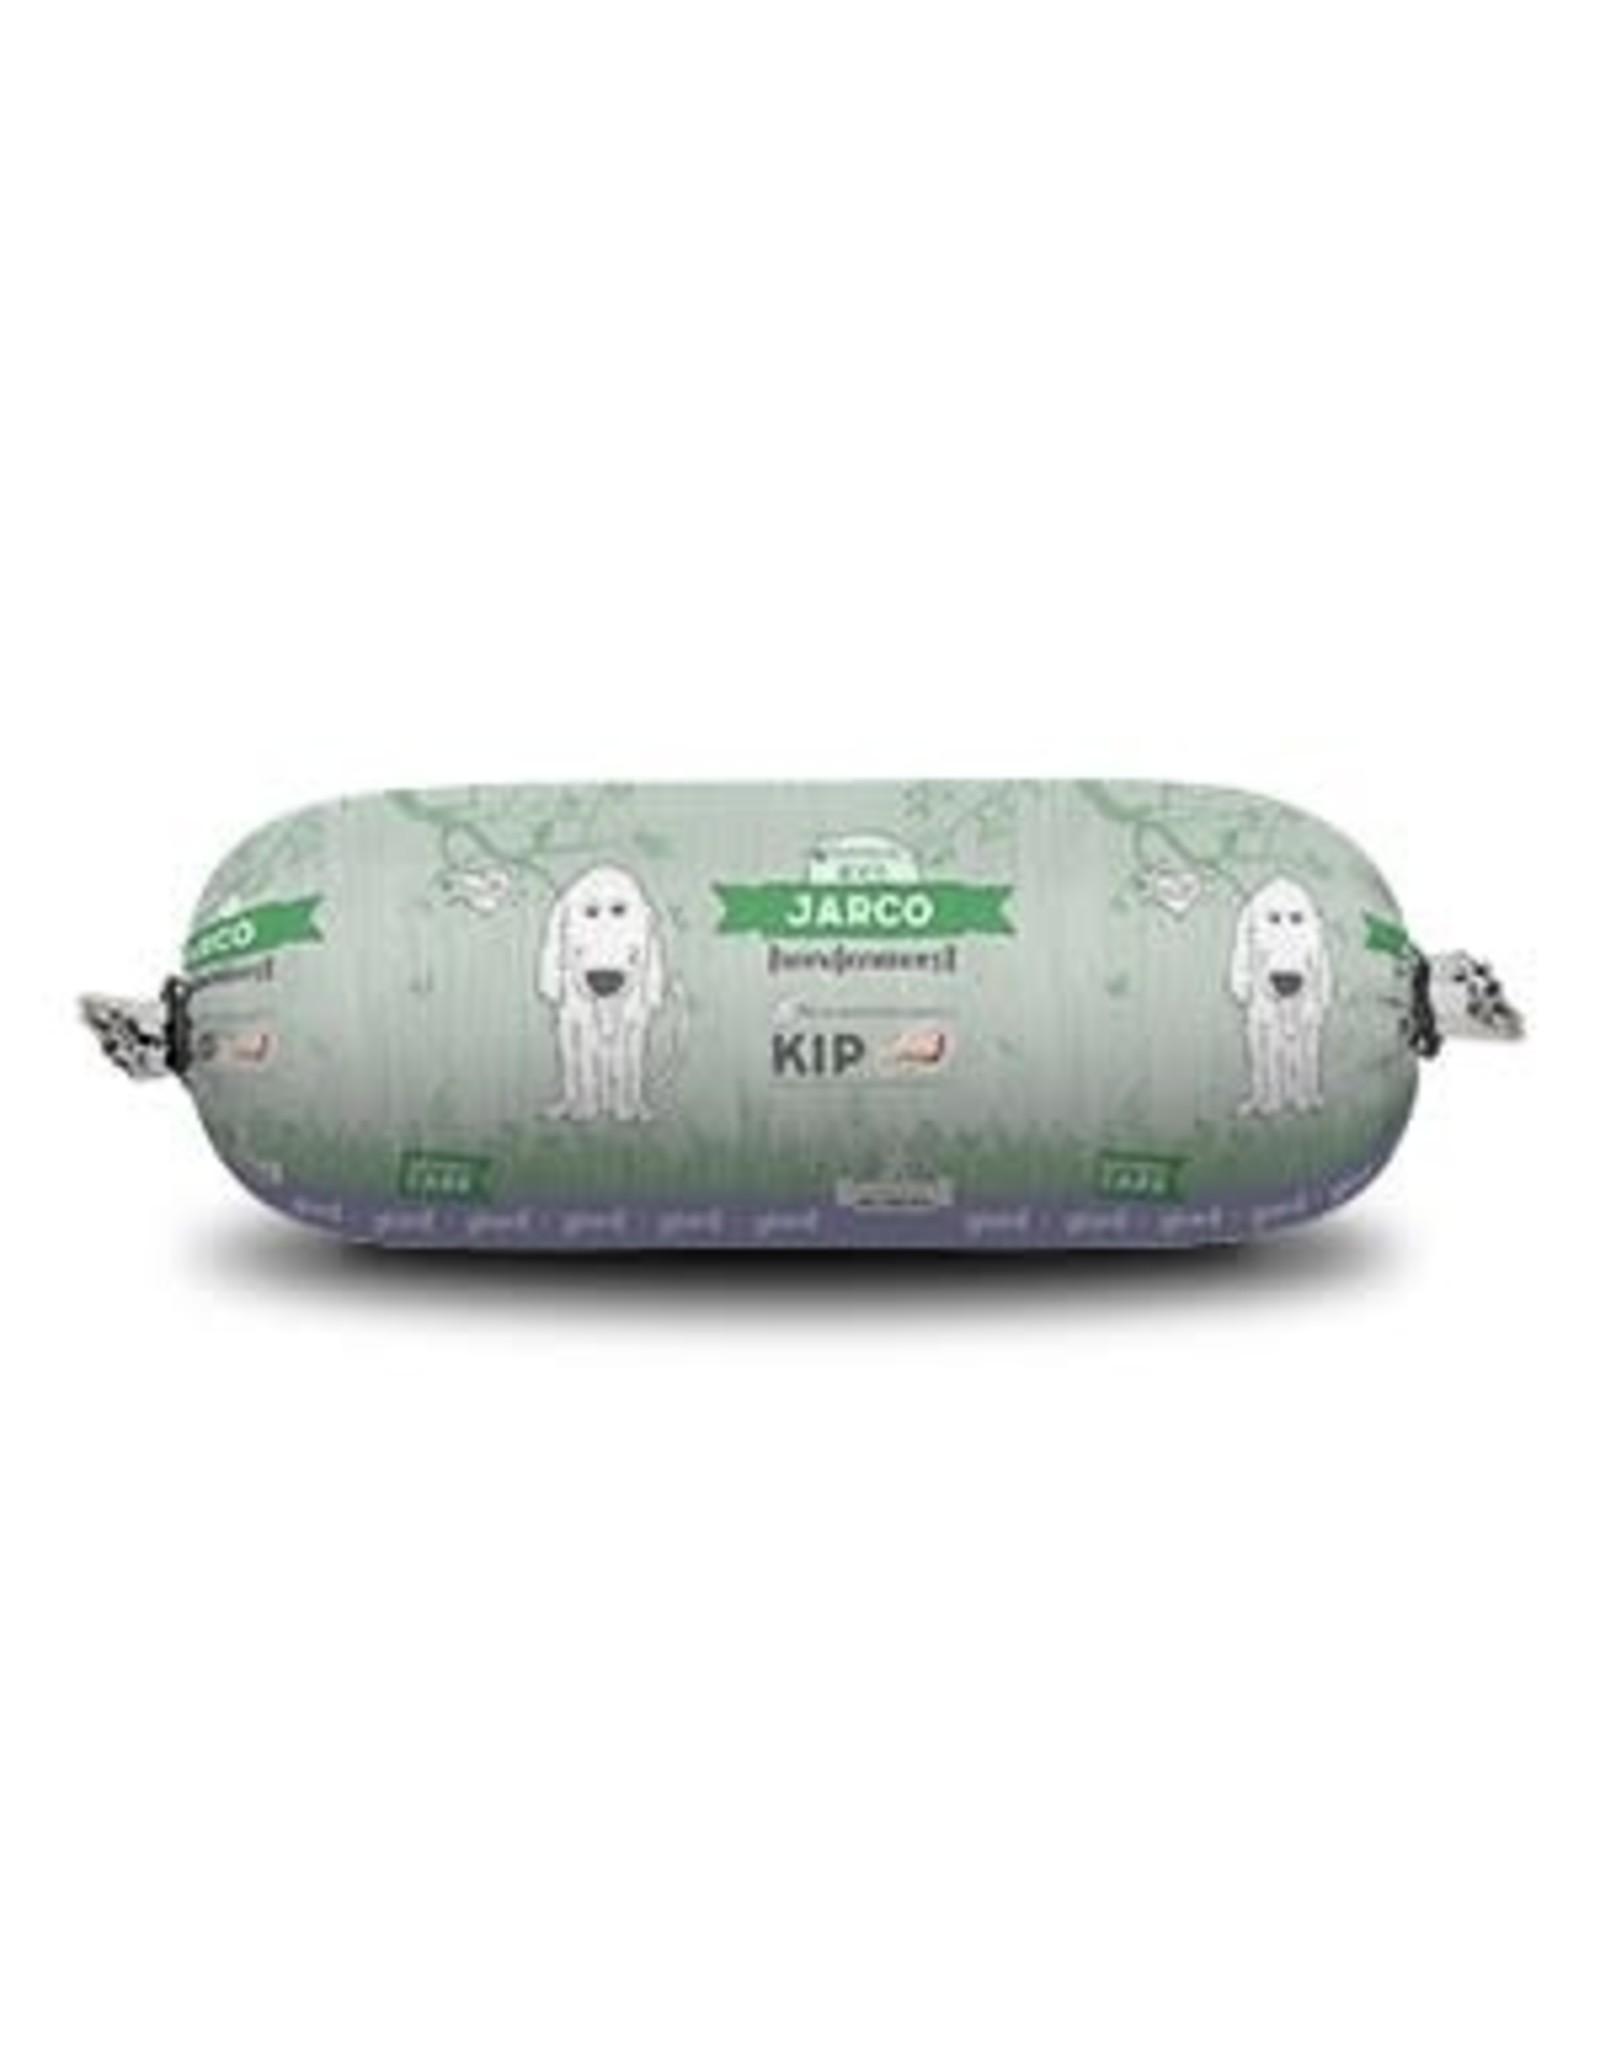 Jarco Hondenworst Giant 46-100 Kg - Kip - 750gram